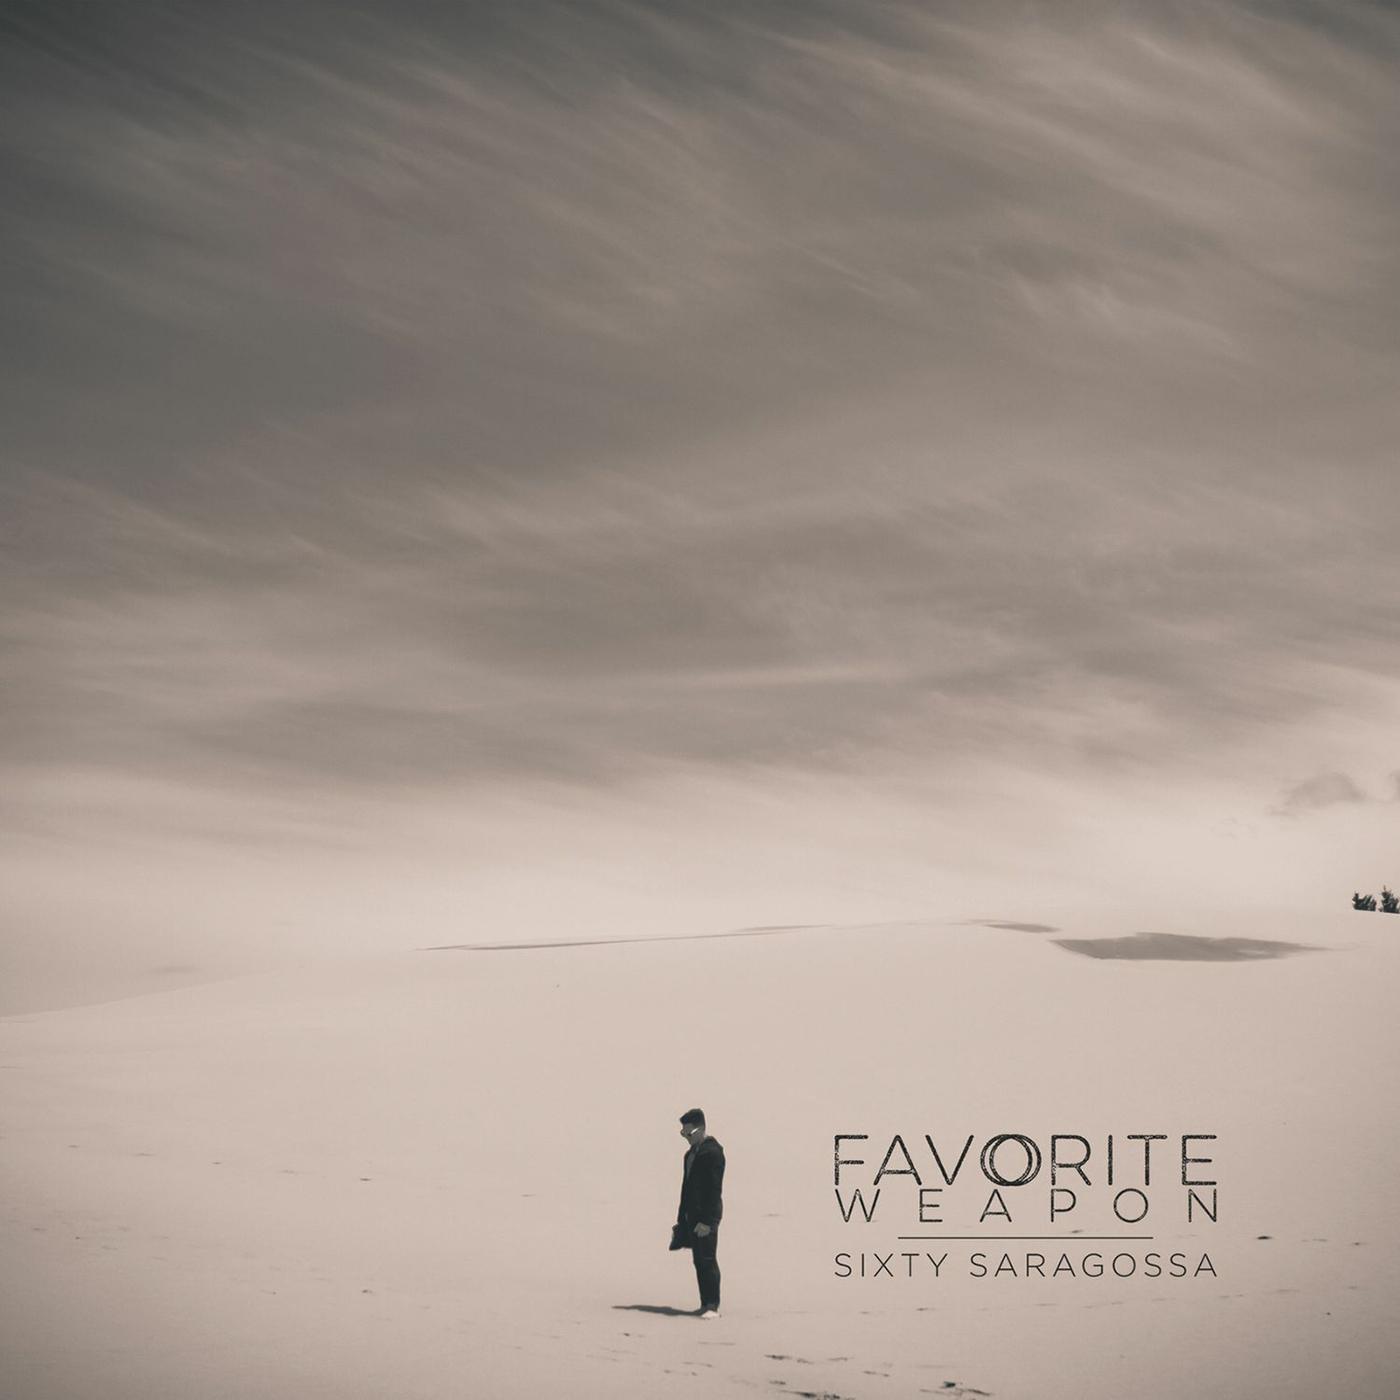 Favorite Weapon - Sixty Saragossa (2014)